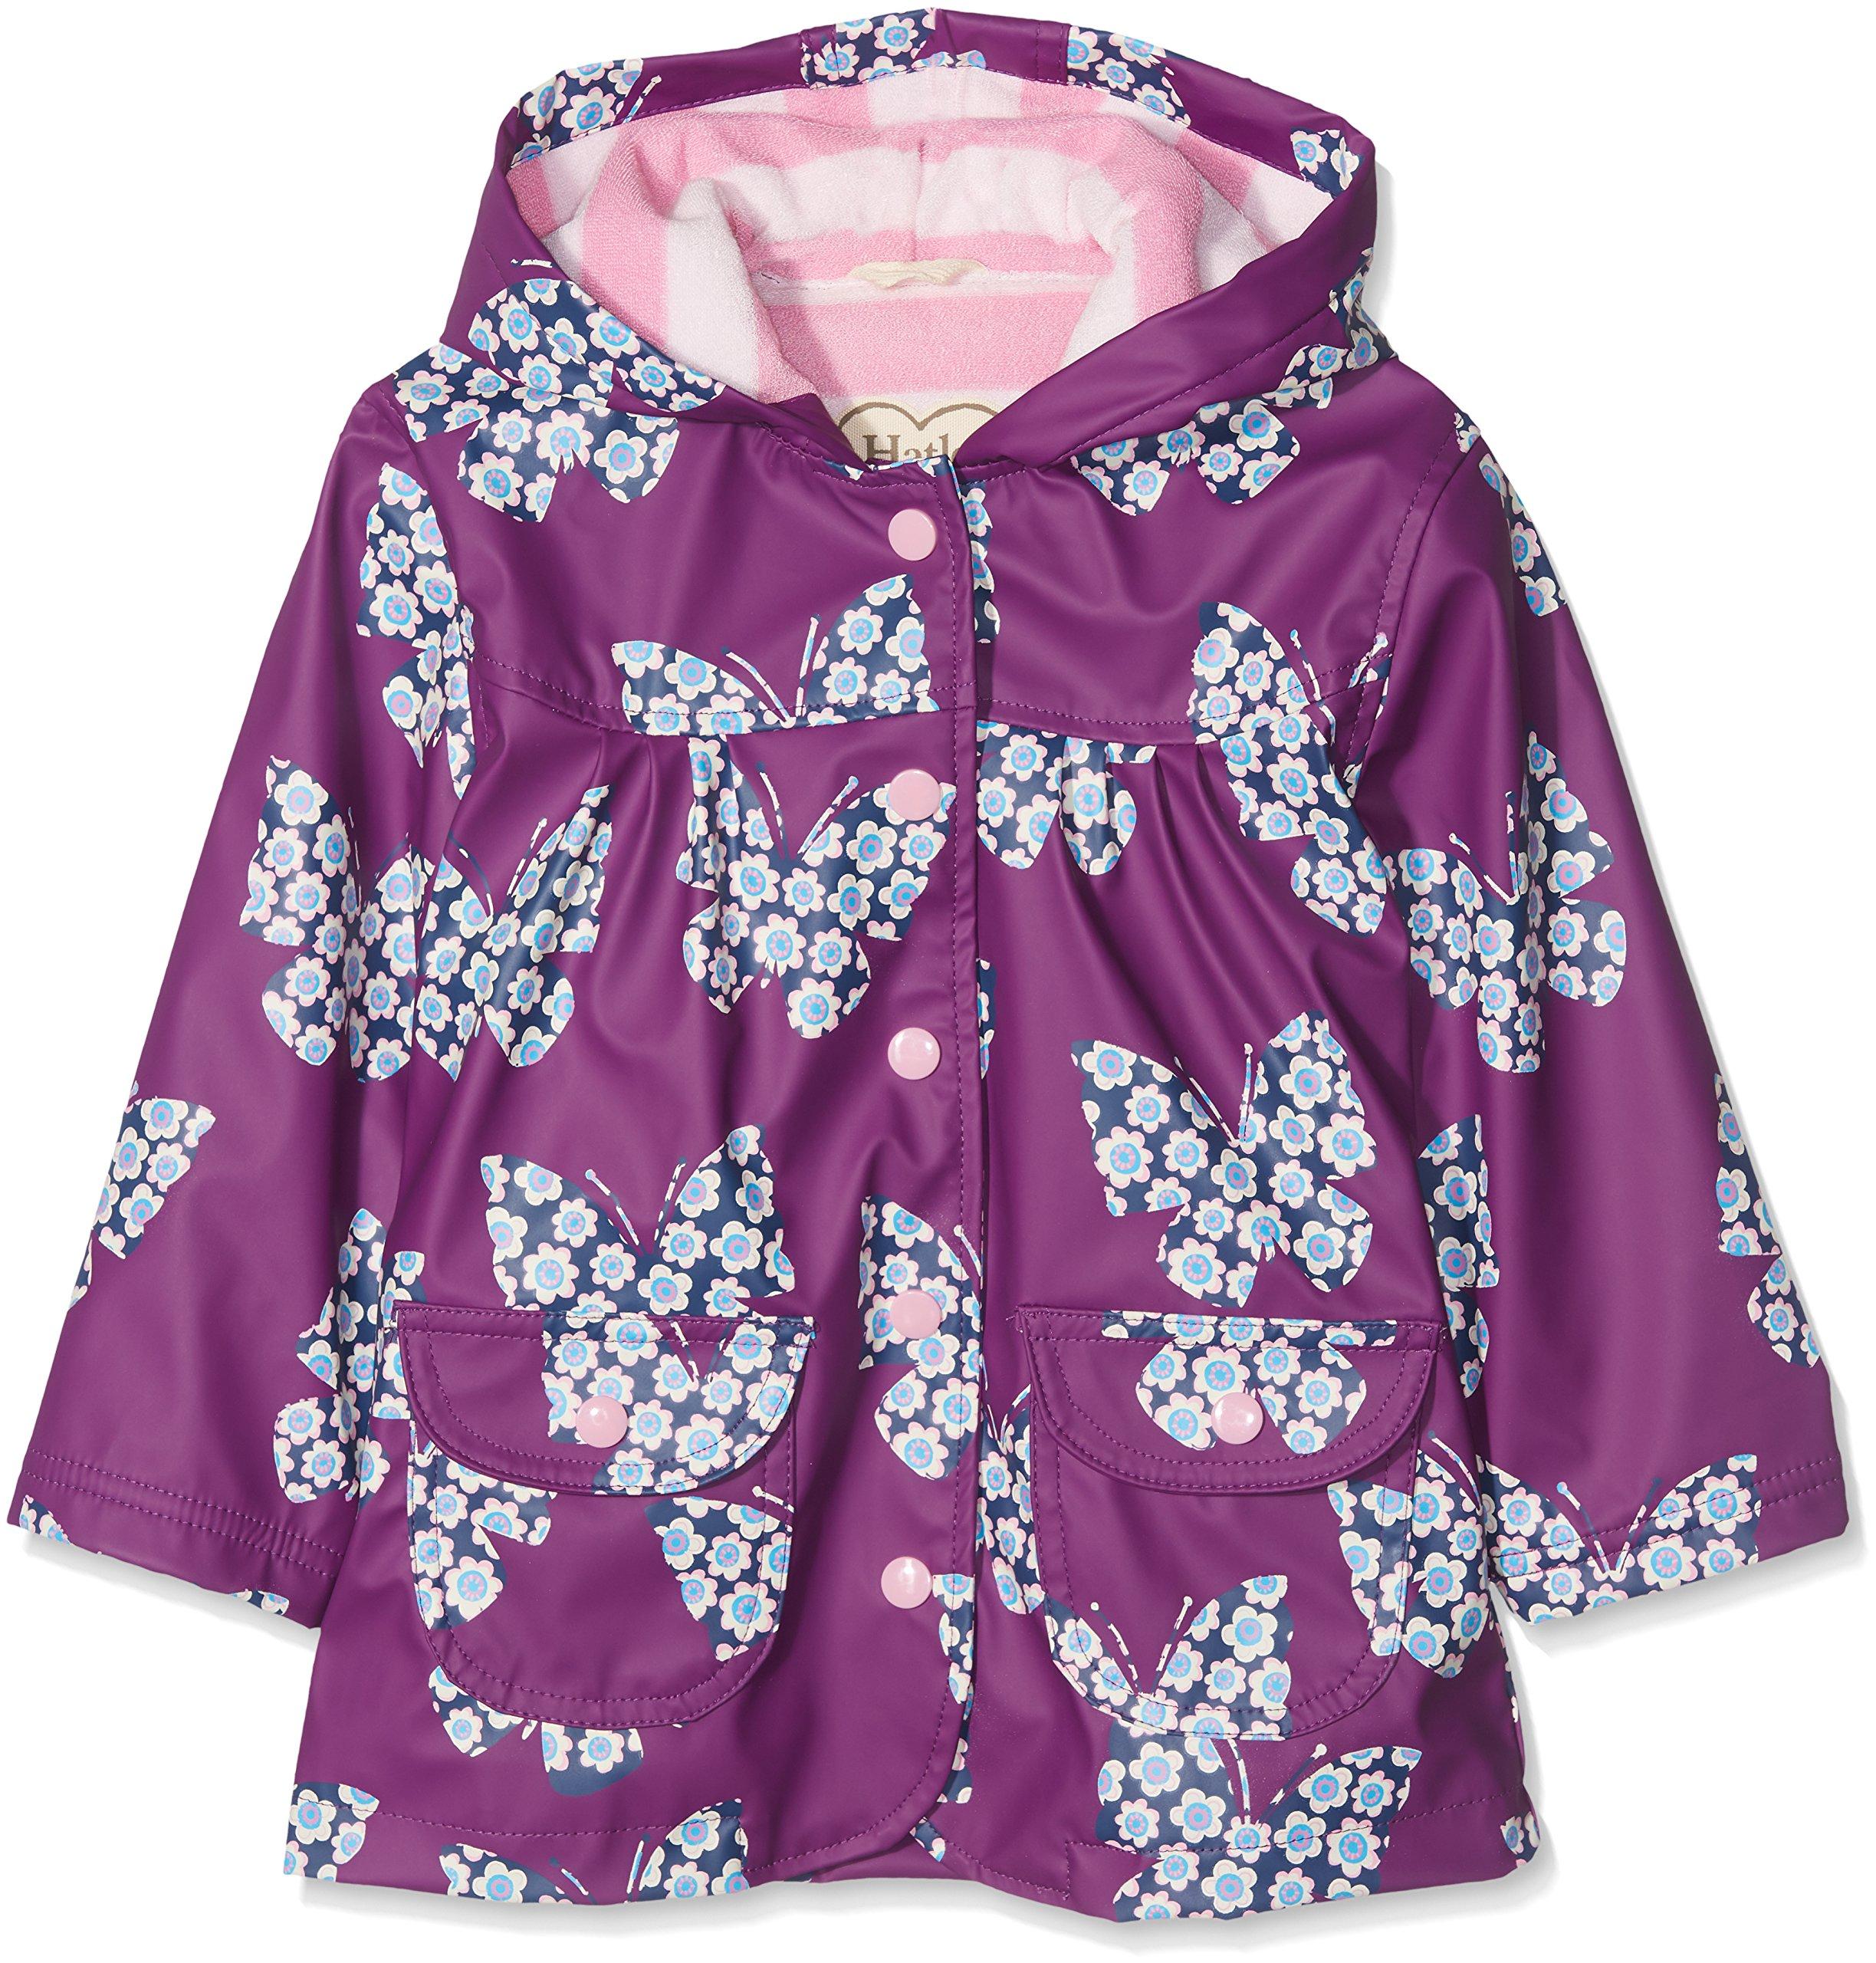 Hatley Girls' Little Printed Raincoats, Buttrflies and Buds, 3